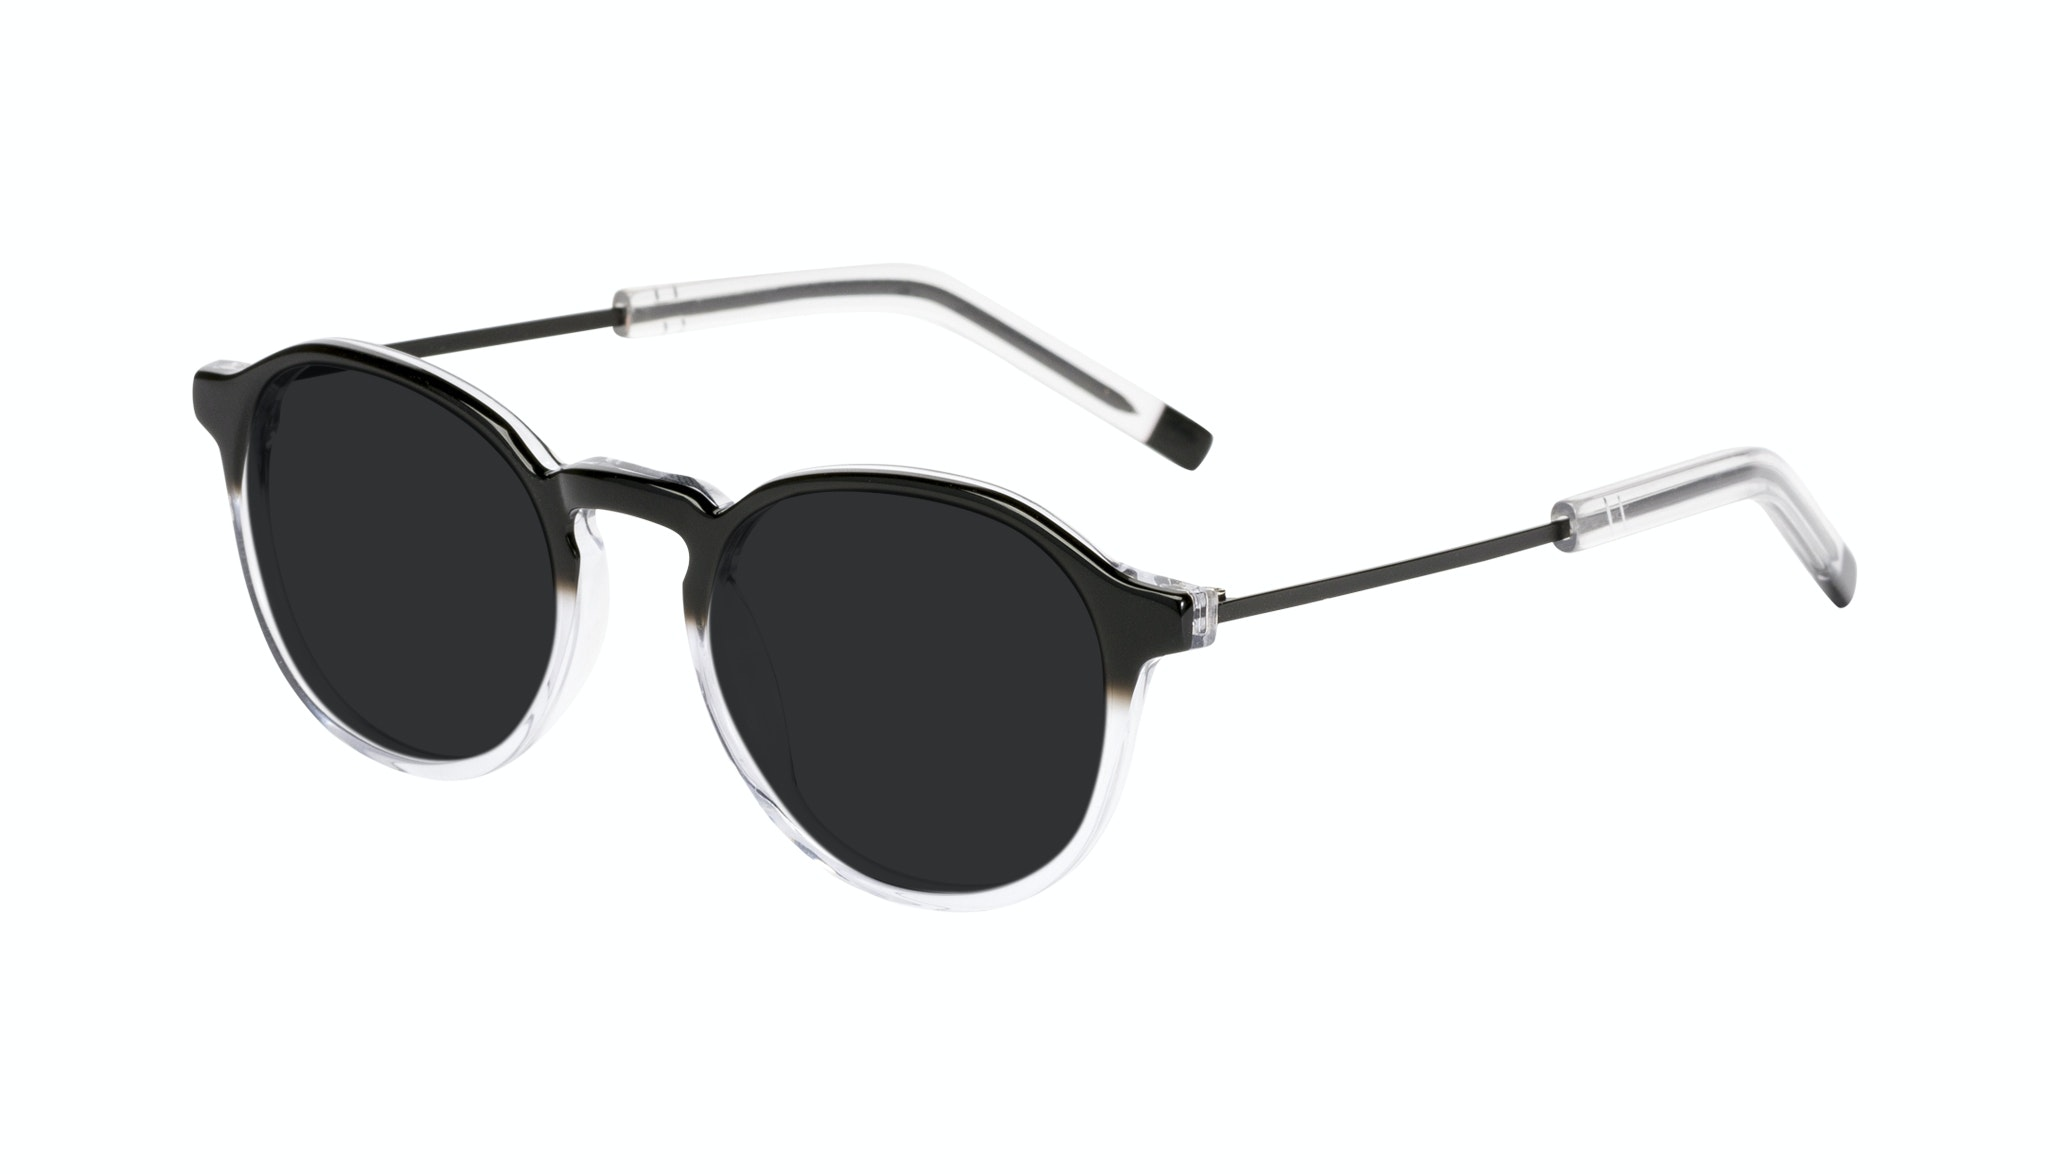 Affordable Fashion Glasses Round Sunglasses Men Prime Onyx Clear Tilt